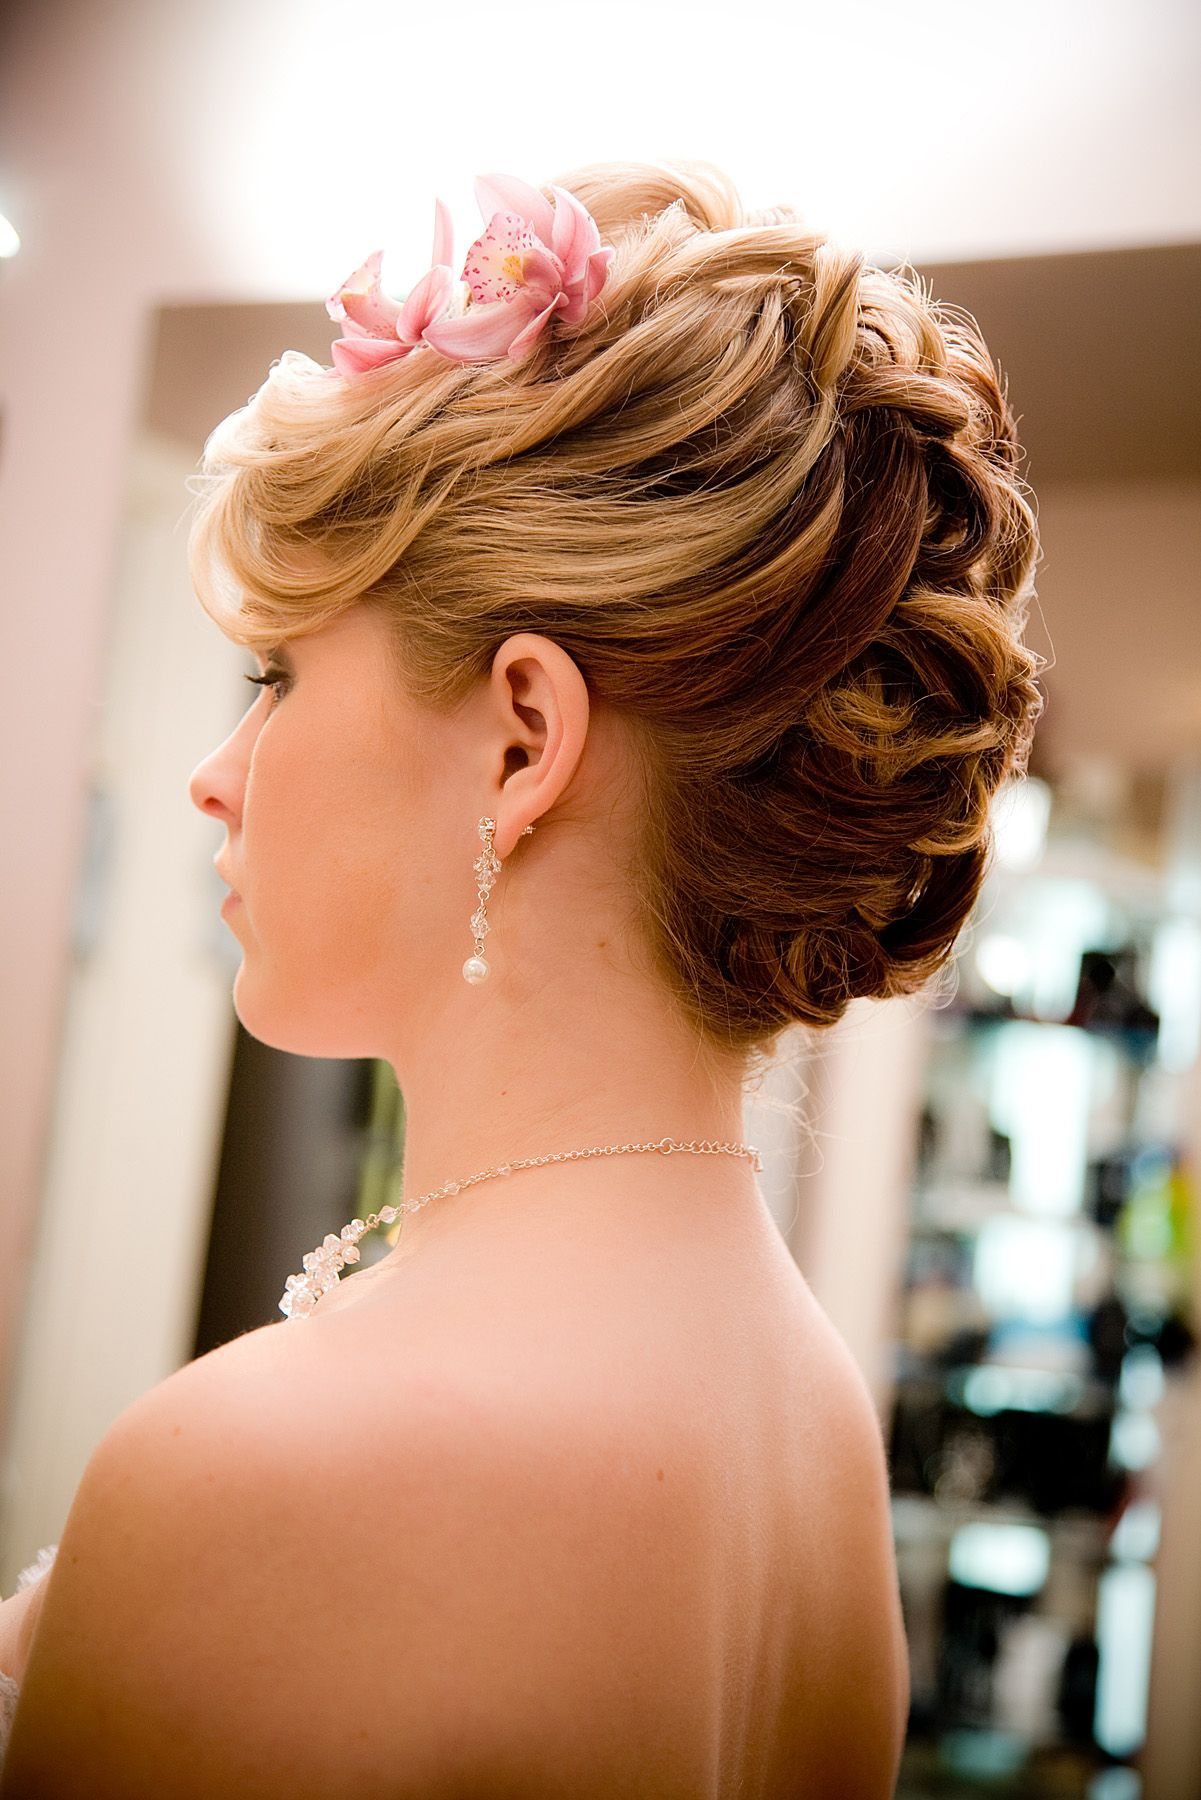 maffeo salon in nanaimo | wedding hair / makeup & nails